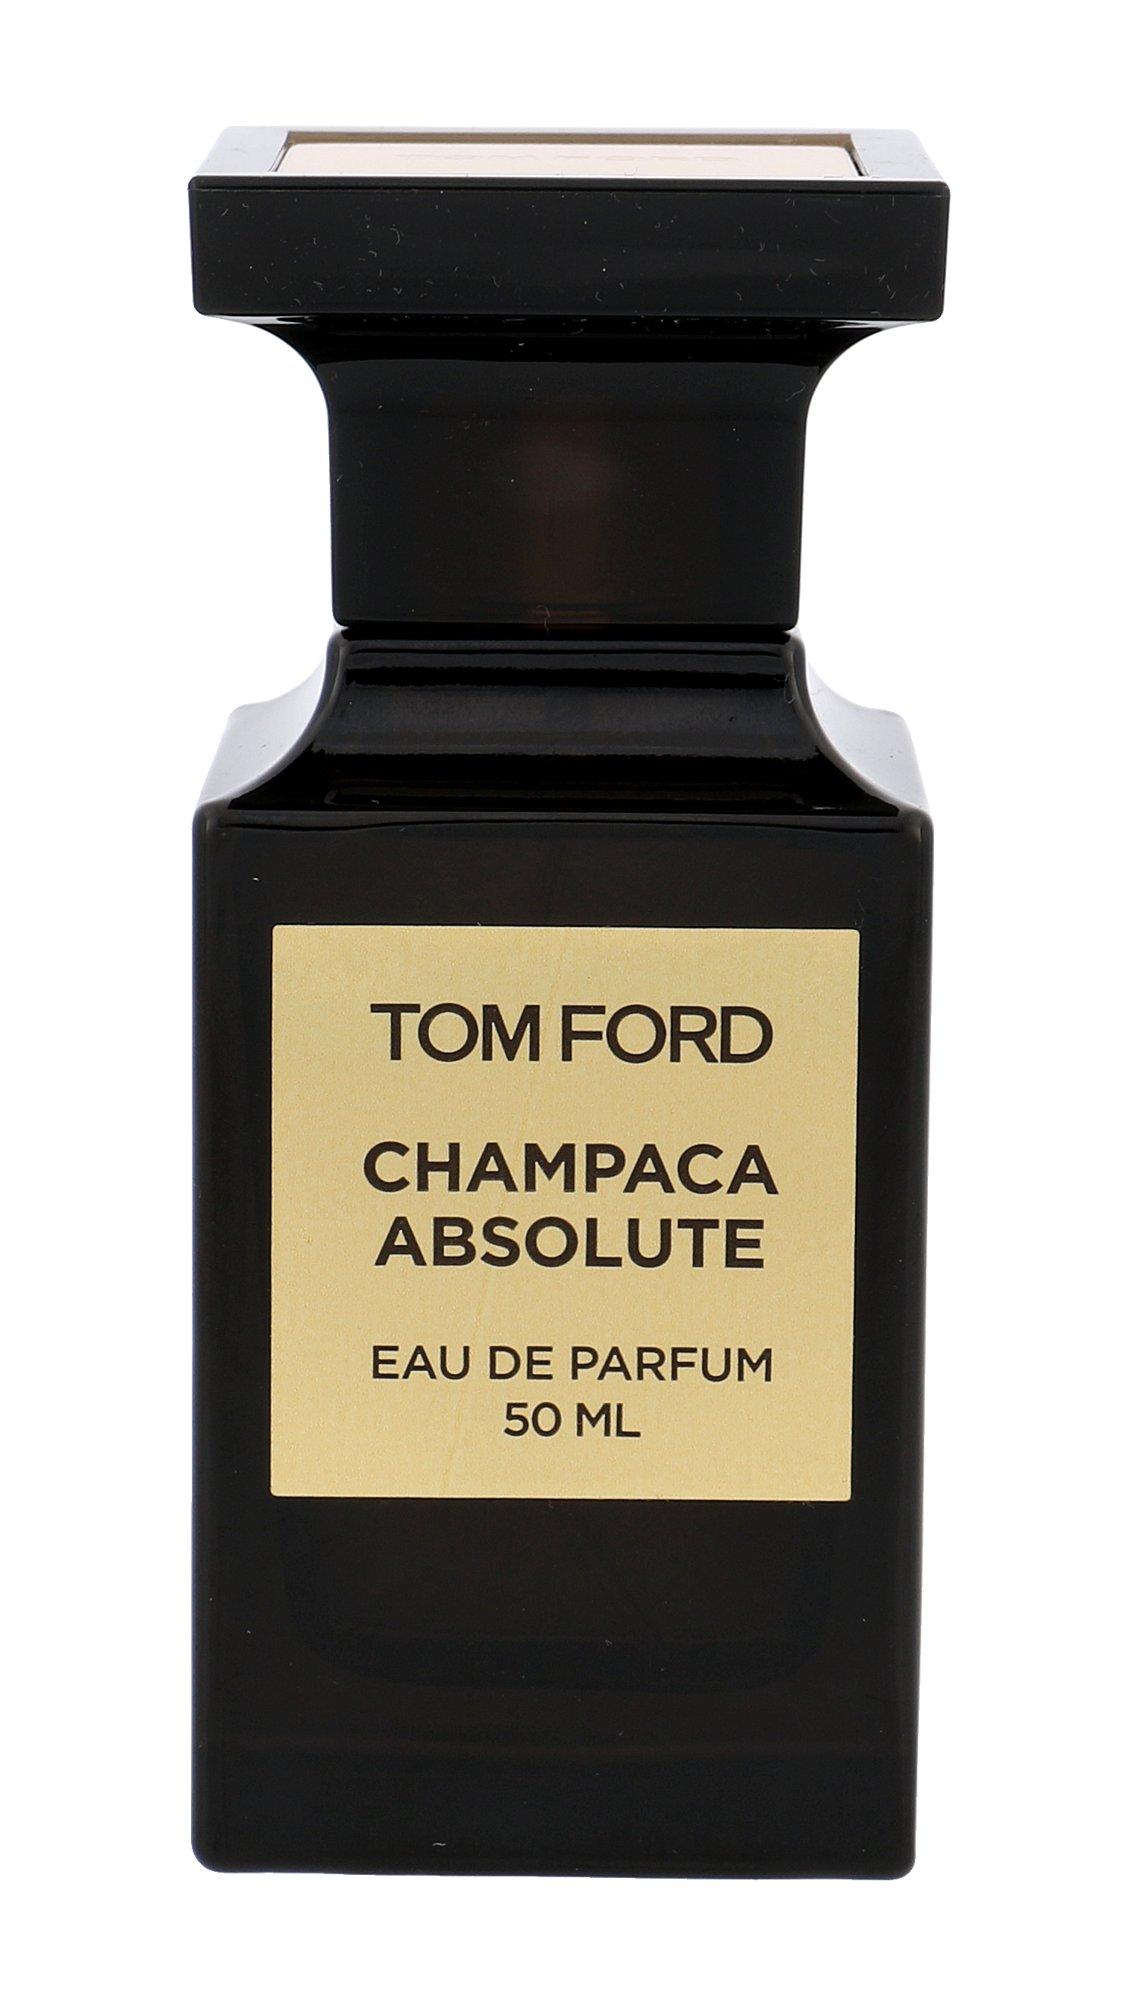 TOM FORD Champaca Absolute, edp 50ml